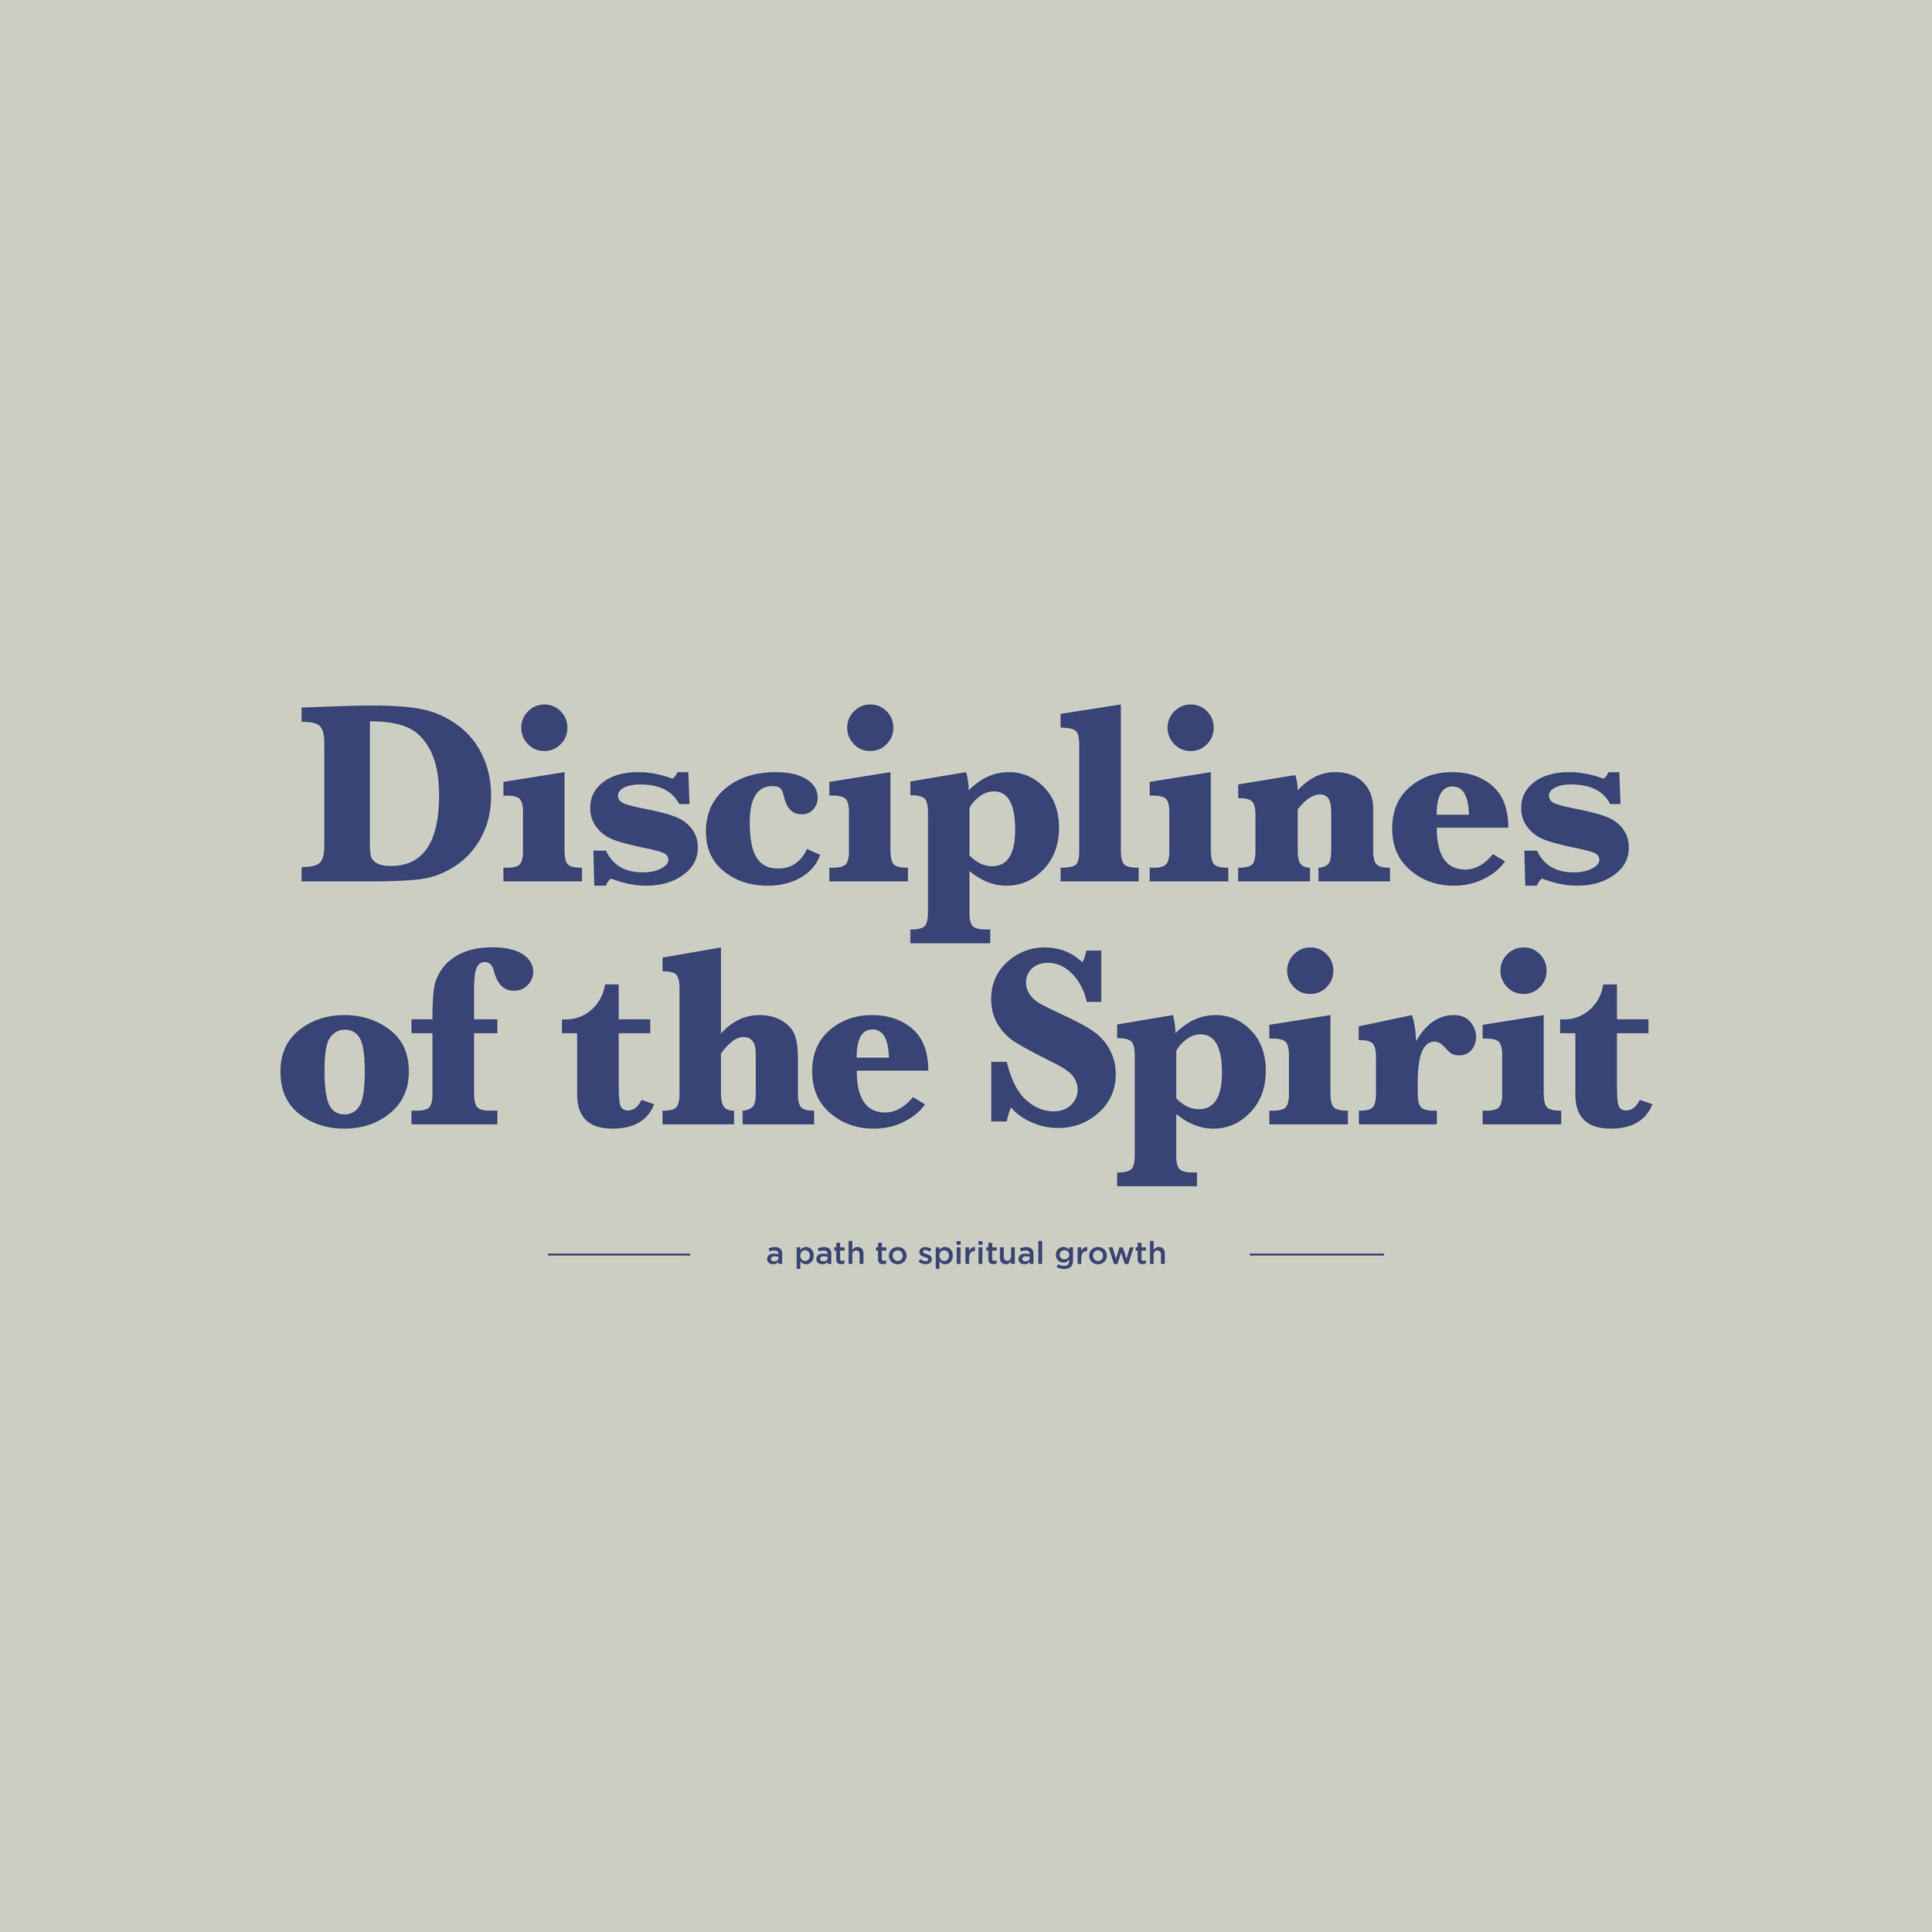 Disciplines_Instagram-01.jpg